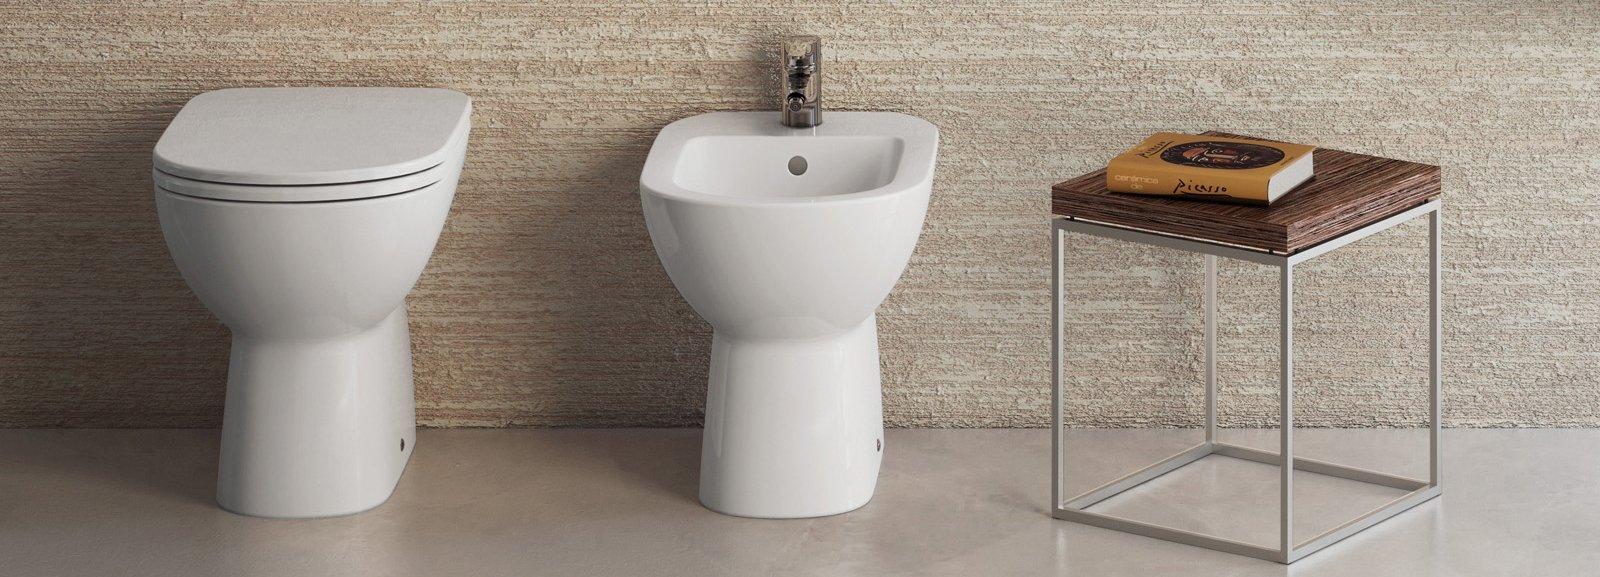 Bagno Senza Bidet Normativa sanitari: ceramica per water e bidet di casa - cose di casa